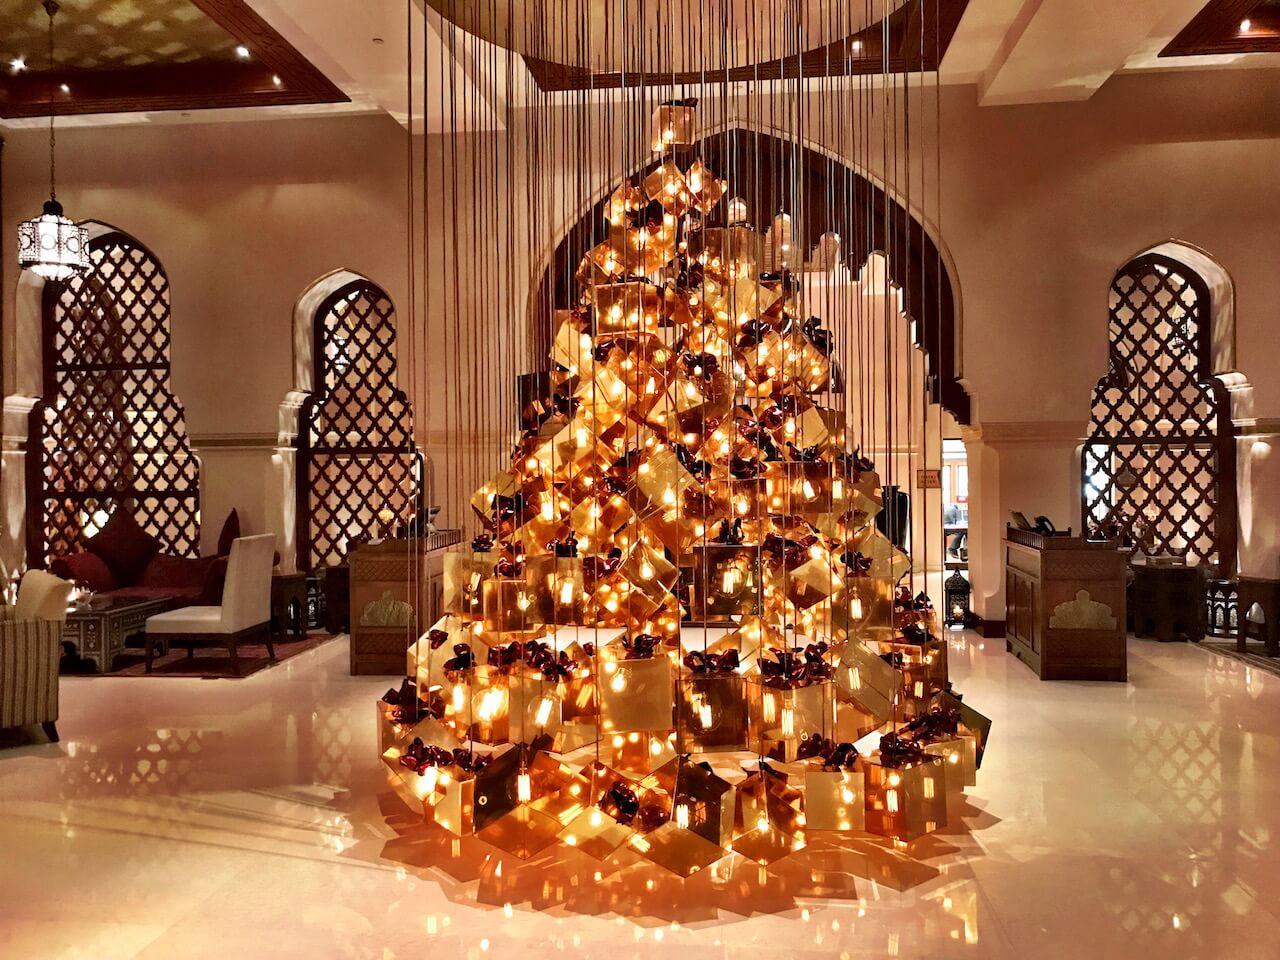 Zauberhafte Weihnachten Im Hotel Annaway The Palace Dubai Annaway